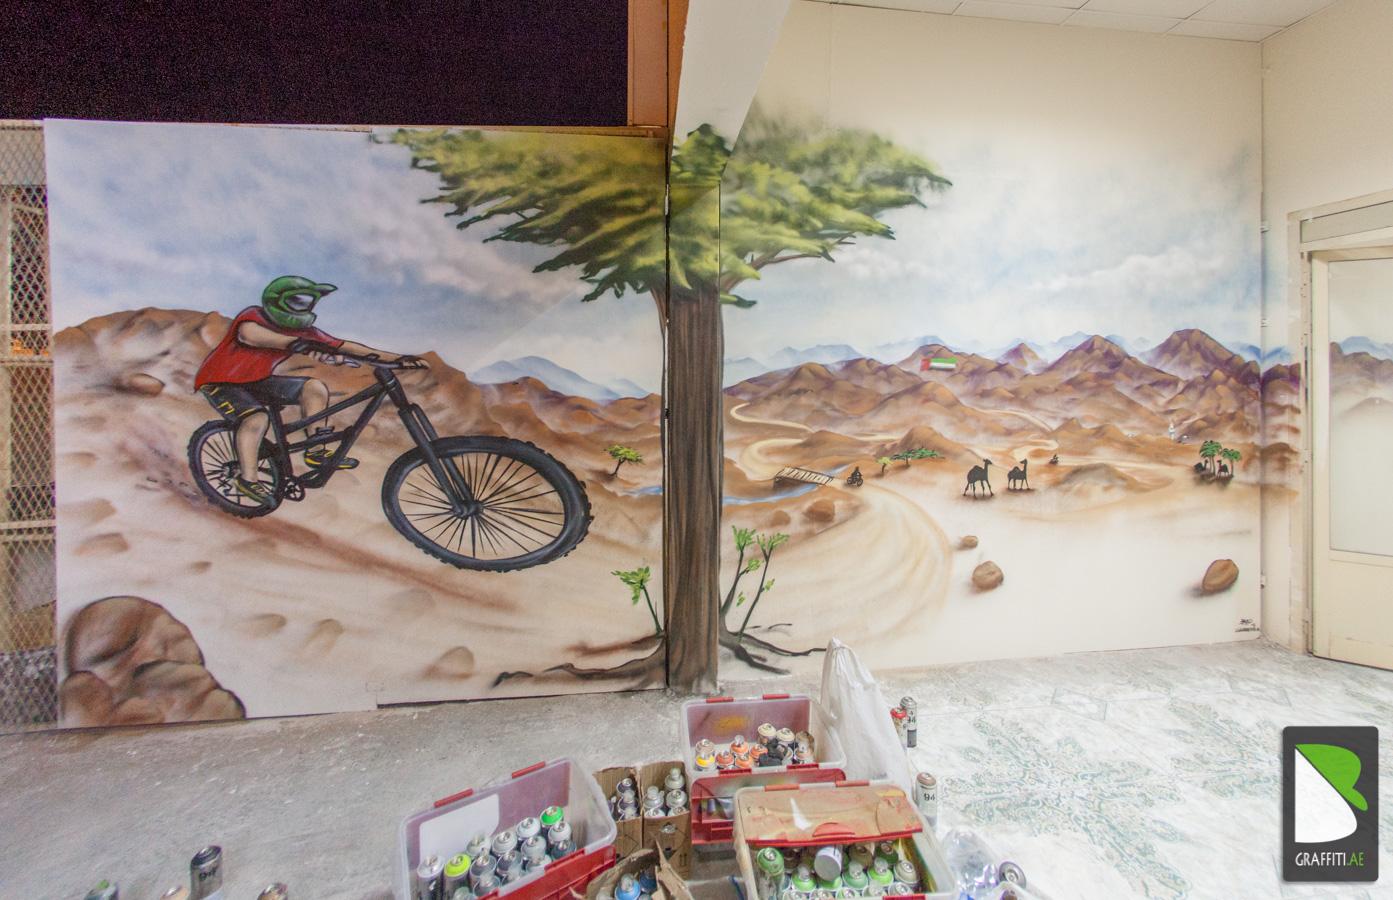 Graffiti wall uae - Uae Graffiti Artist Bike Shawka 7